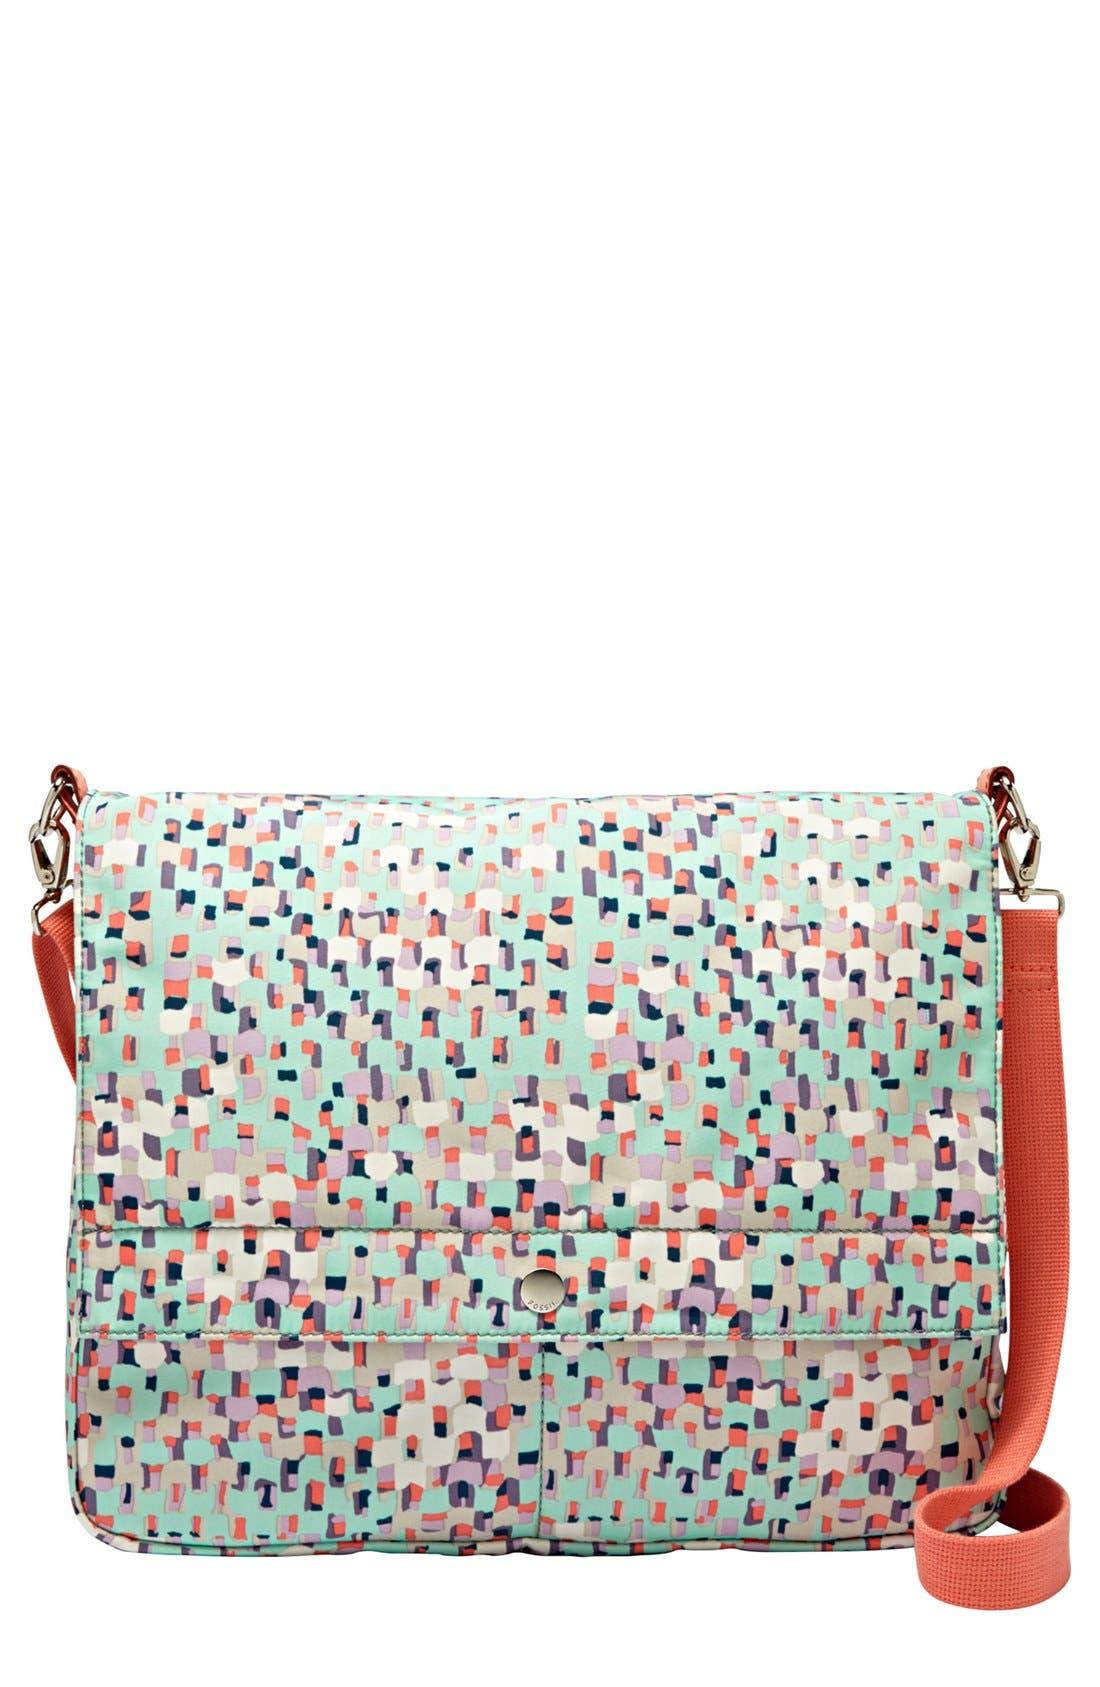 FOSSIL 'Key-Per' Messenger Bag, Main, color, 403